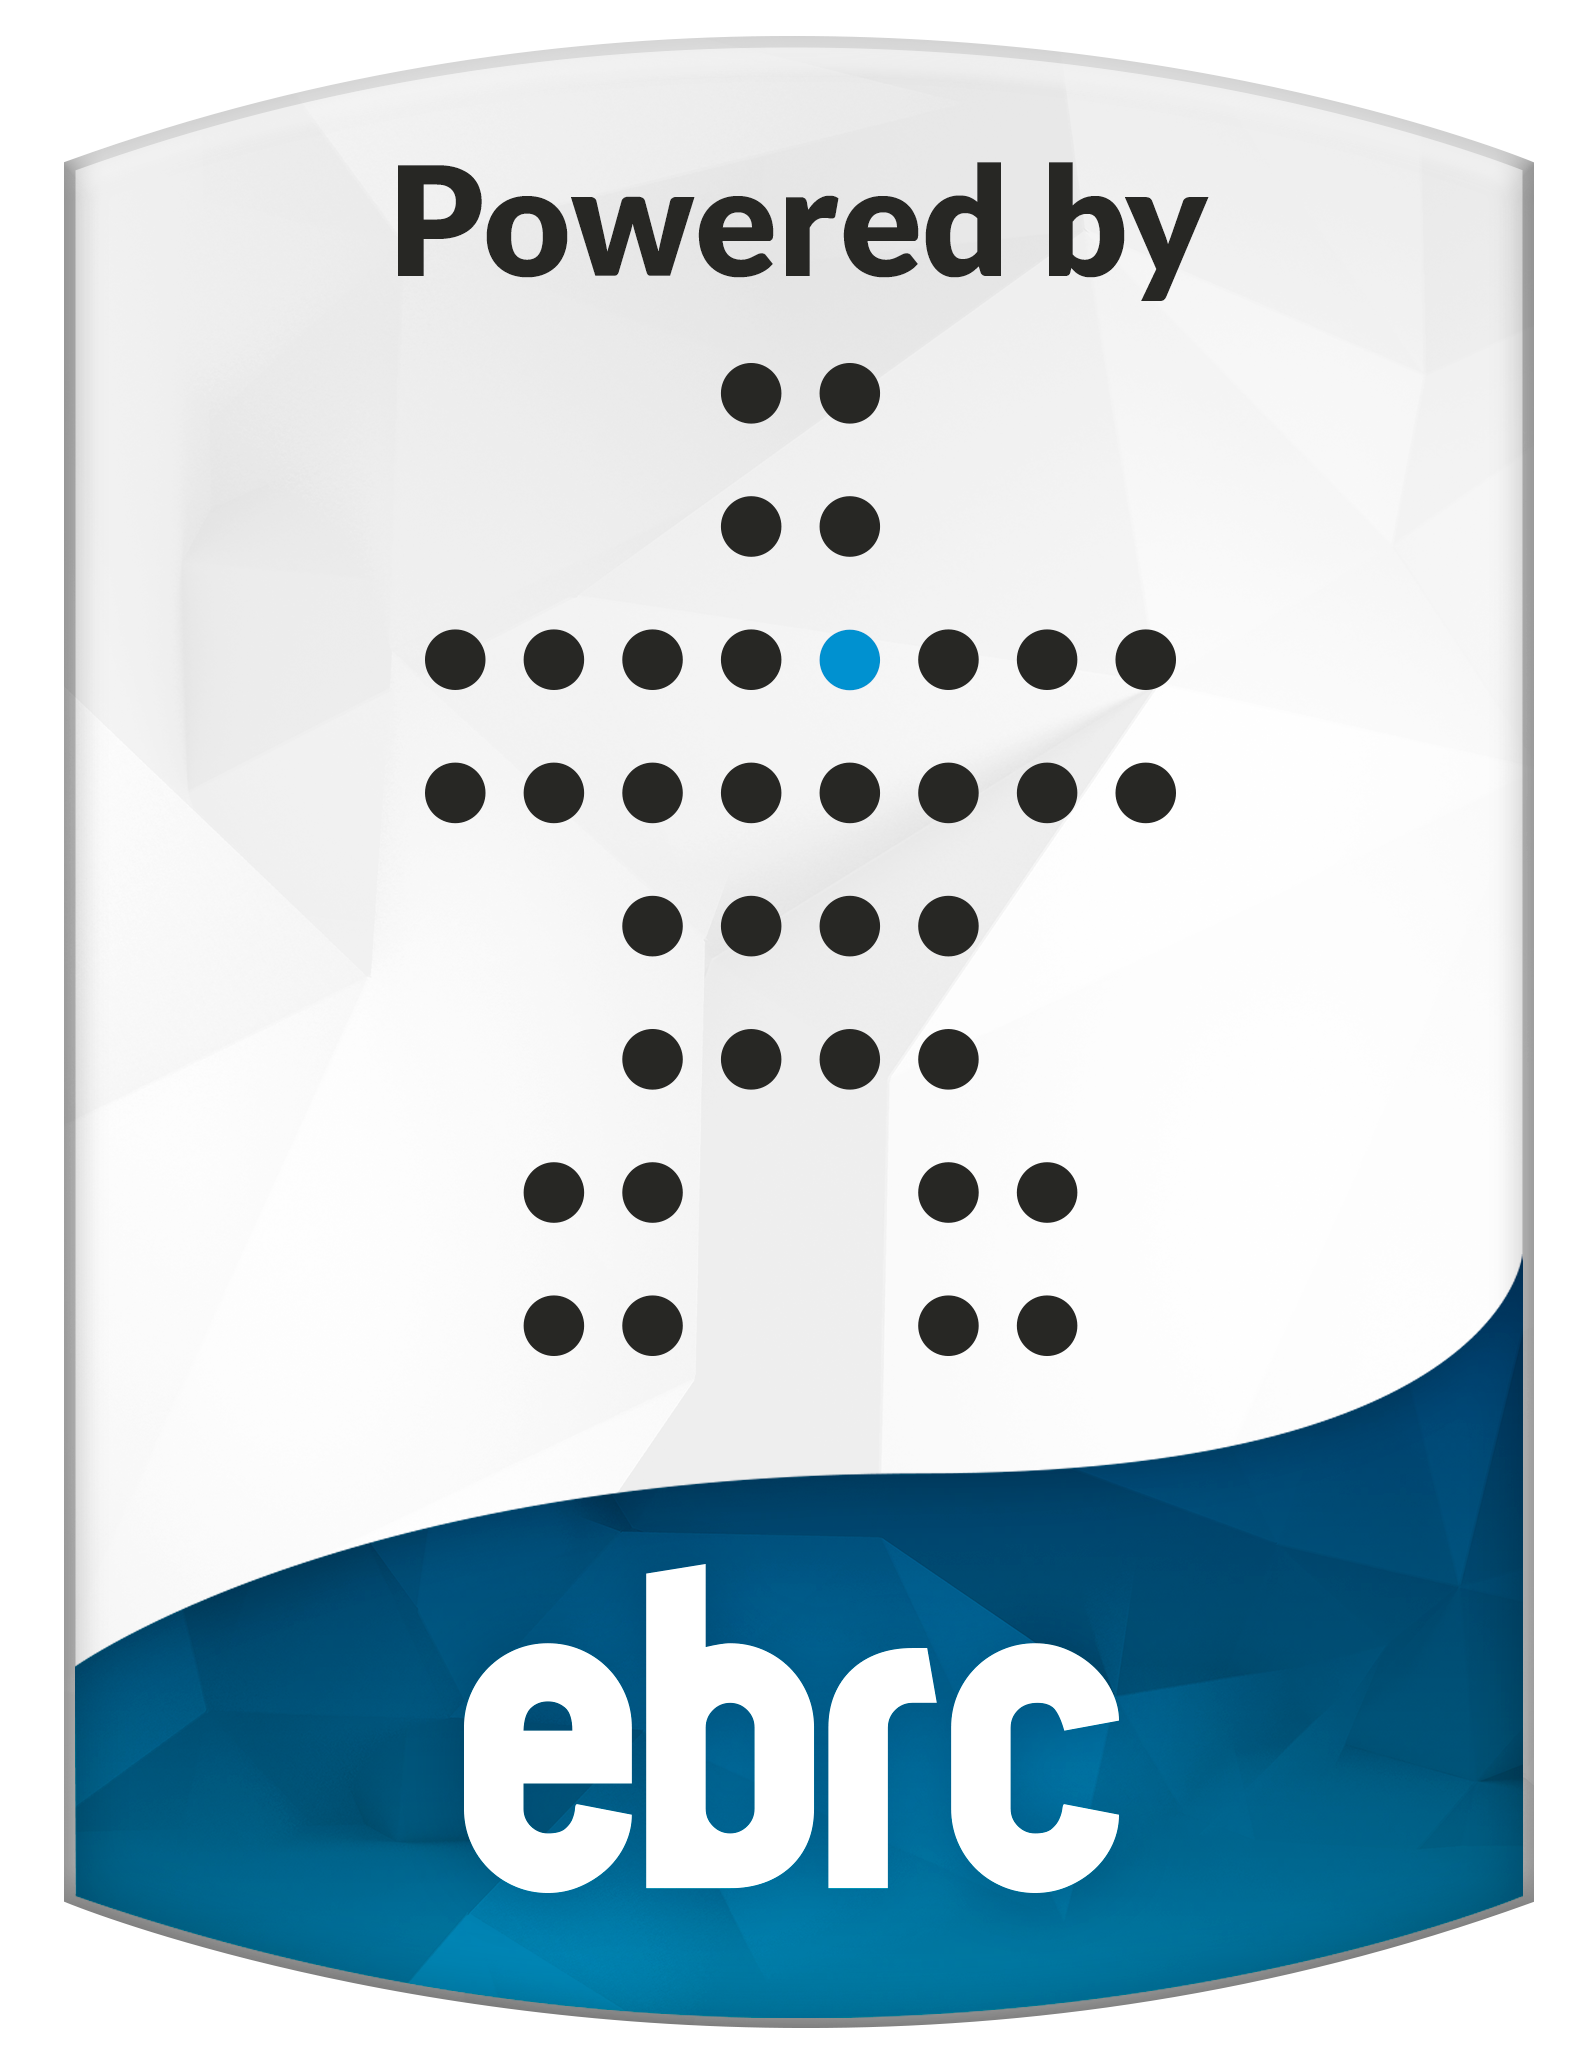 Logo_Poweredby_EBRC_2016